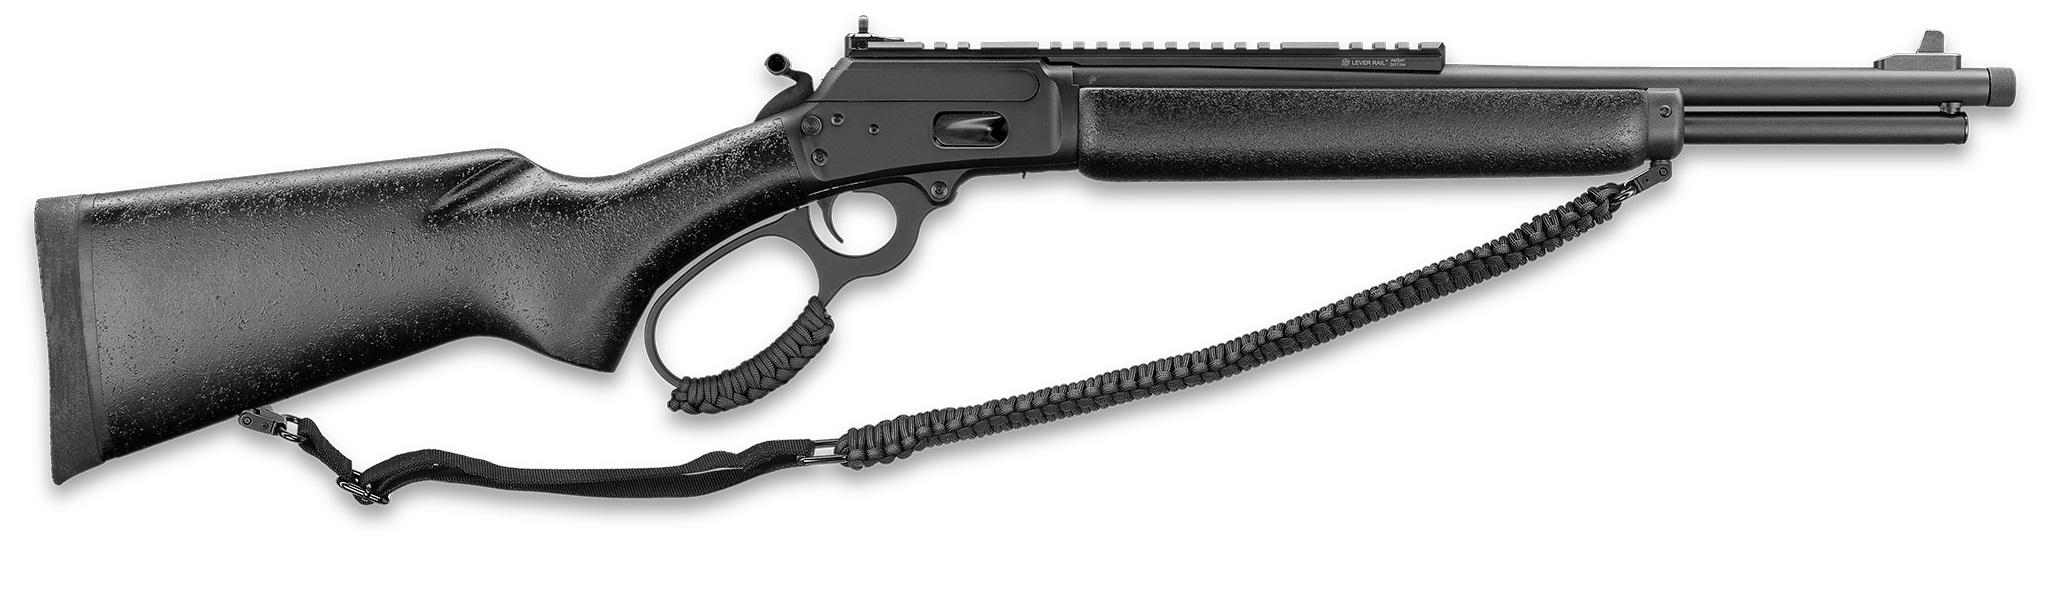 Marlin 1894 Dark Series 44 Magnum | 44 Special